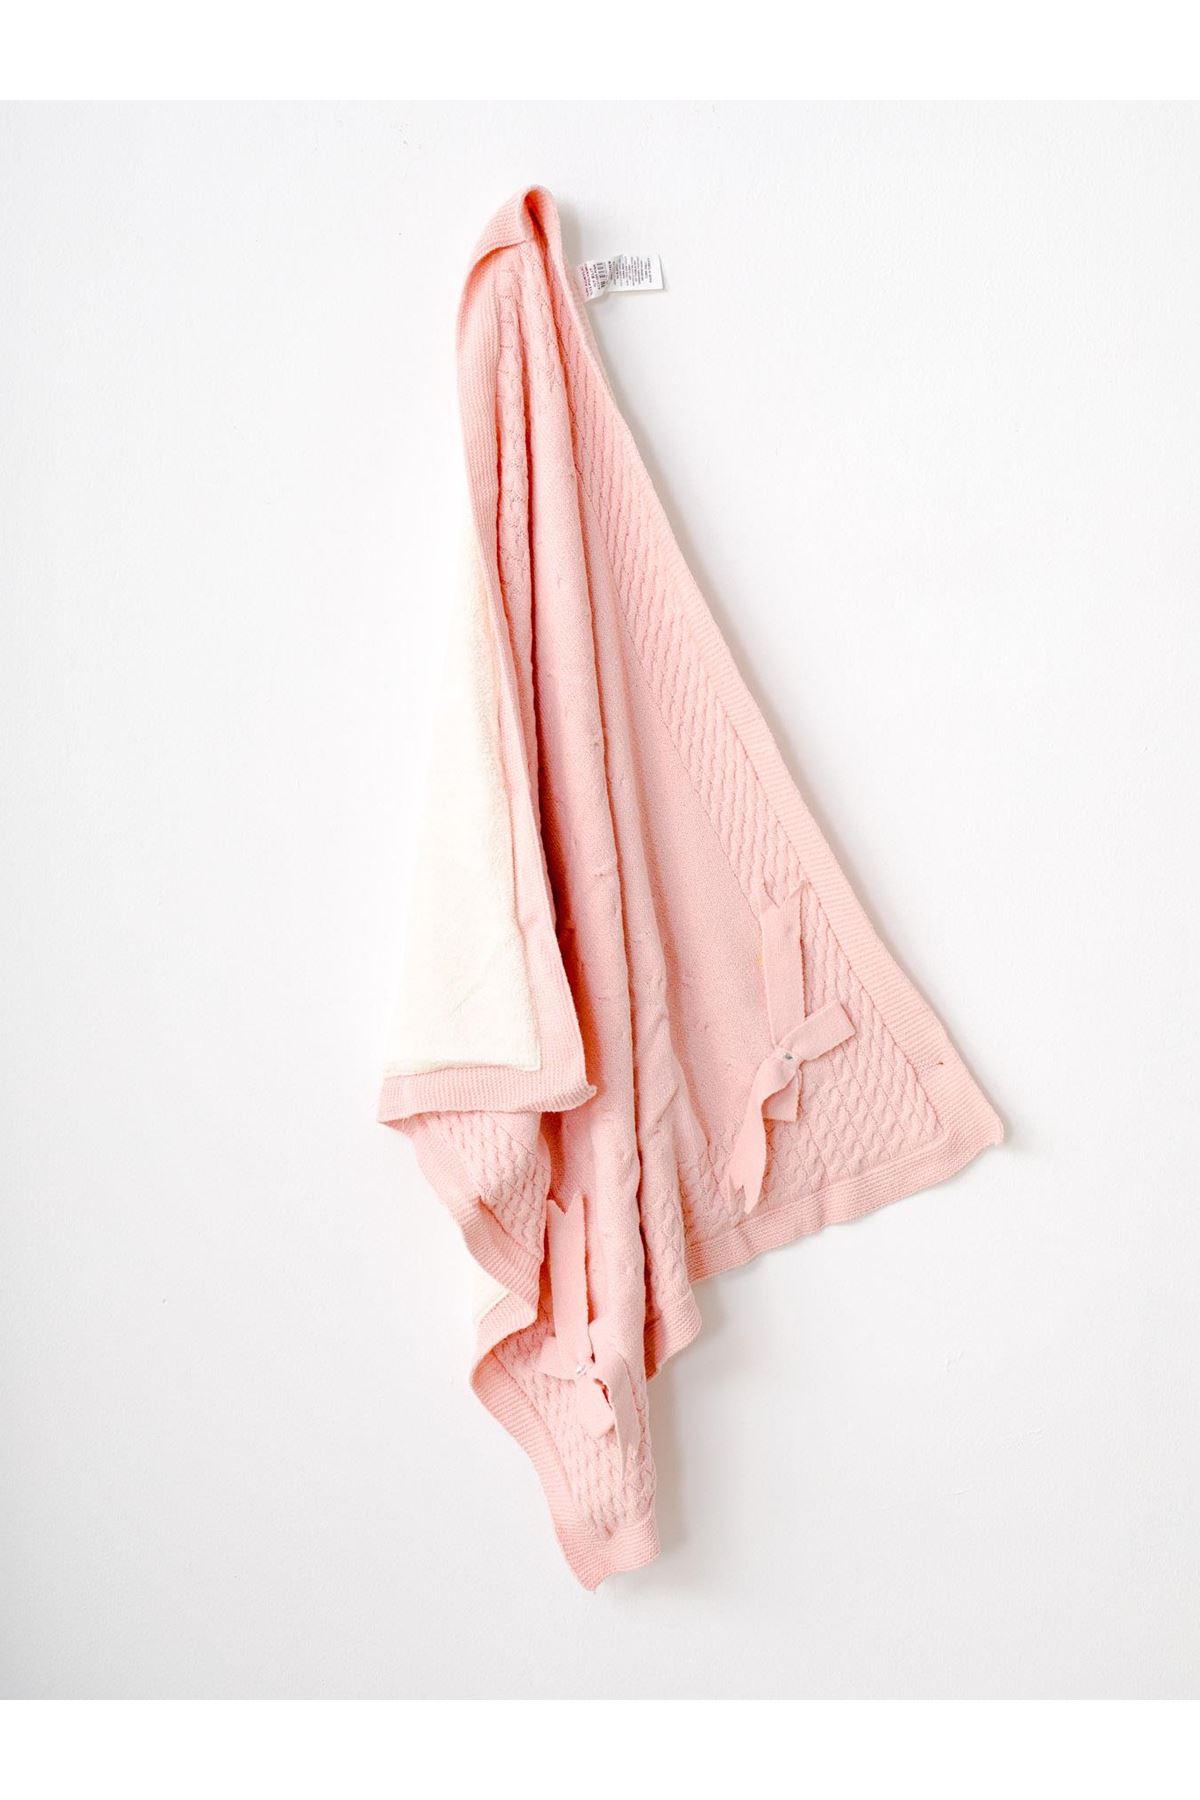 Andywawa AC21255 Bebek Battaniye Pink